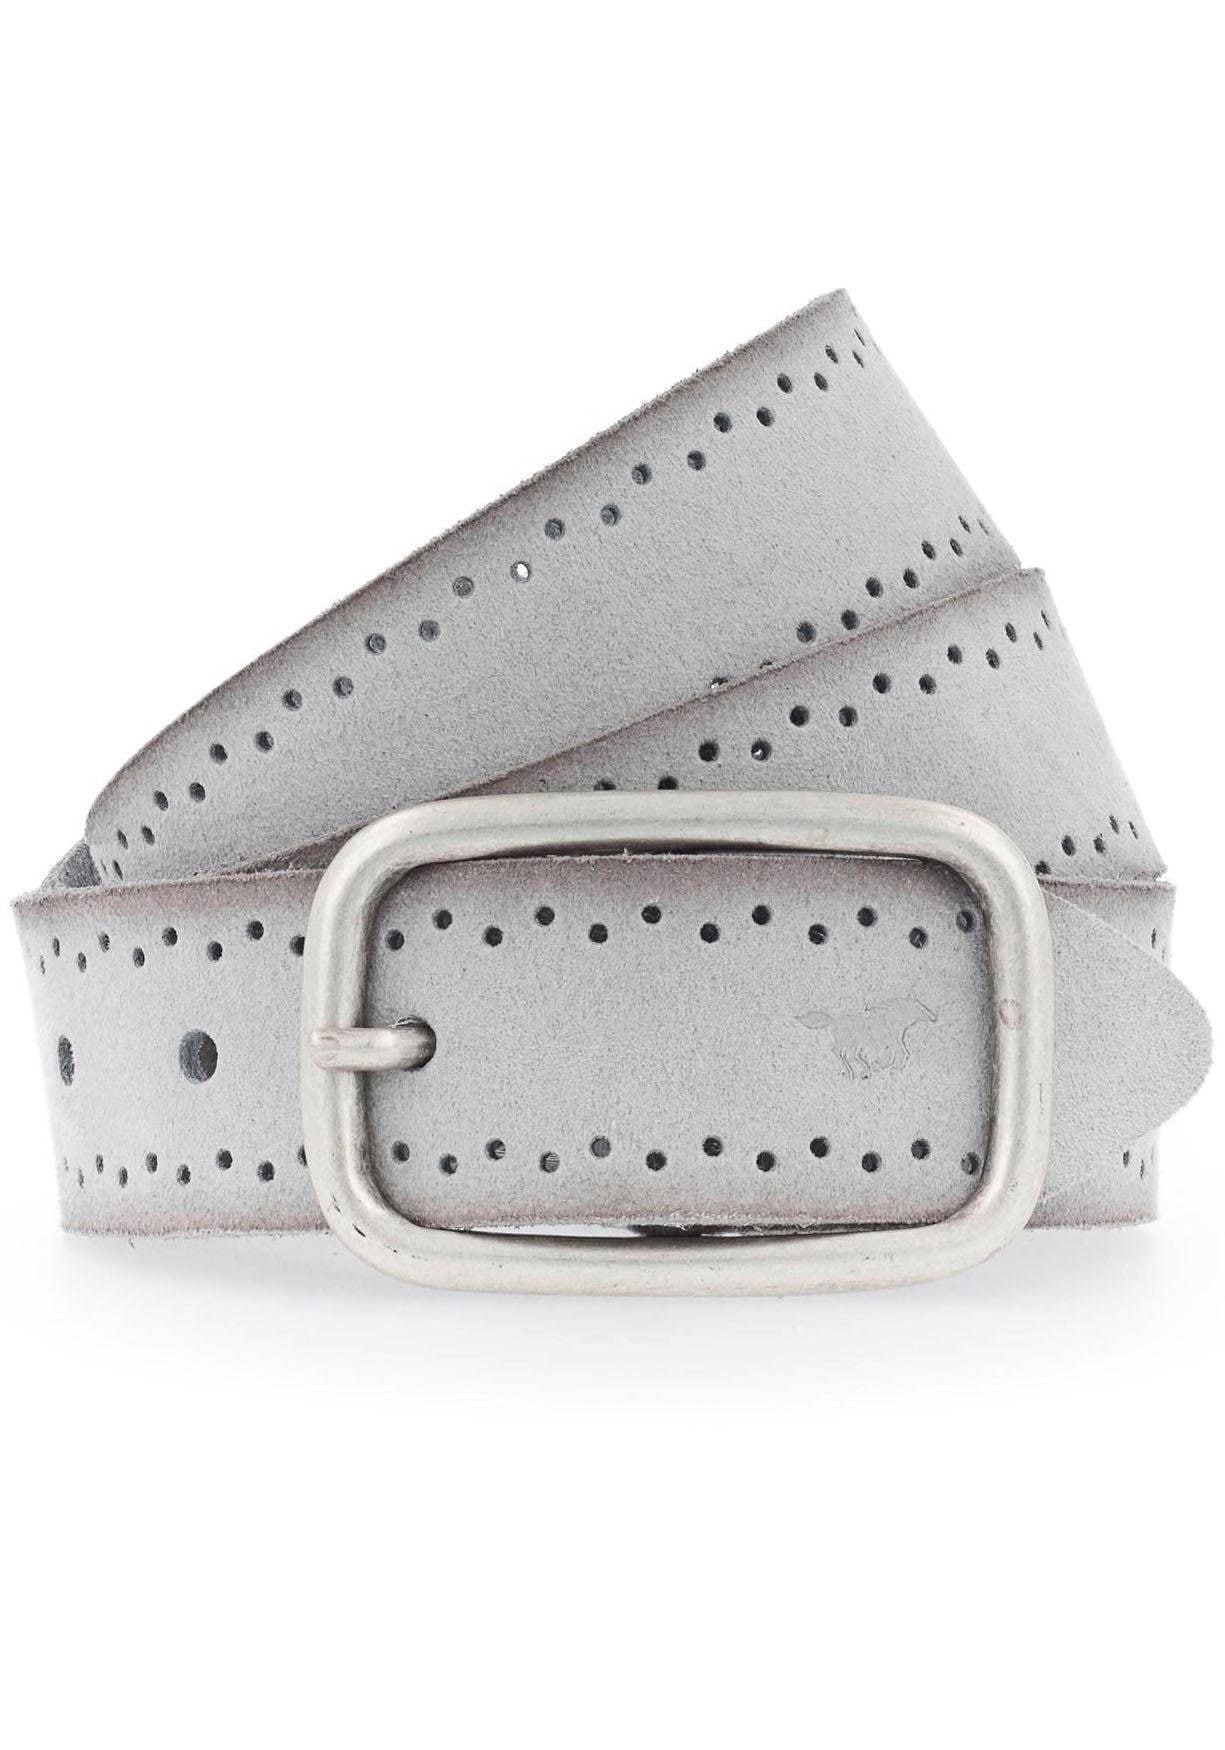 MUSTANG Ledergürtel, Robustes, genarbtes Rindsleder mit Lochstanzung grau Damen Ledergürtel Gürtel Accessoires